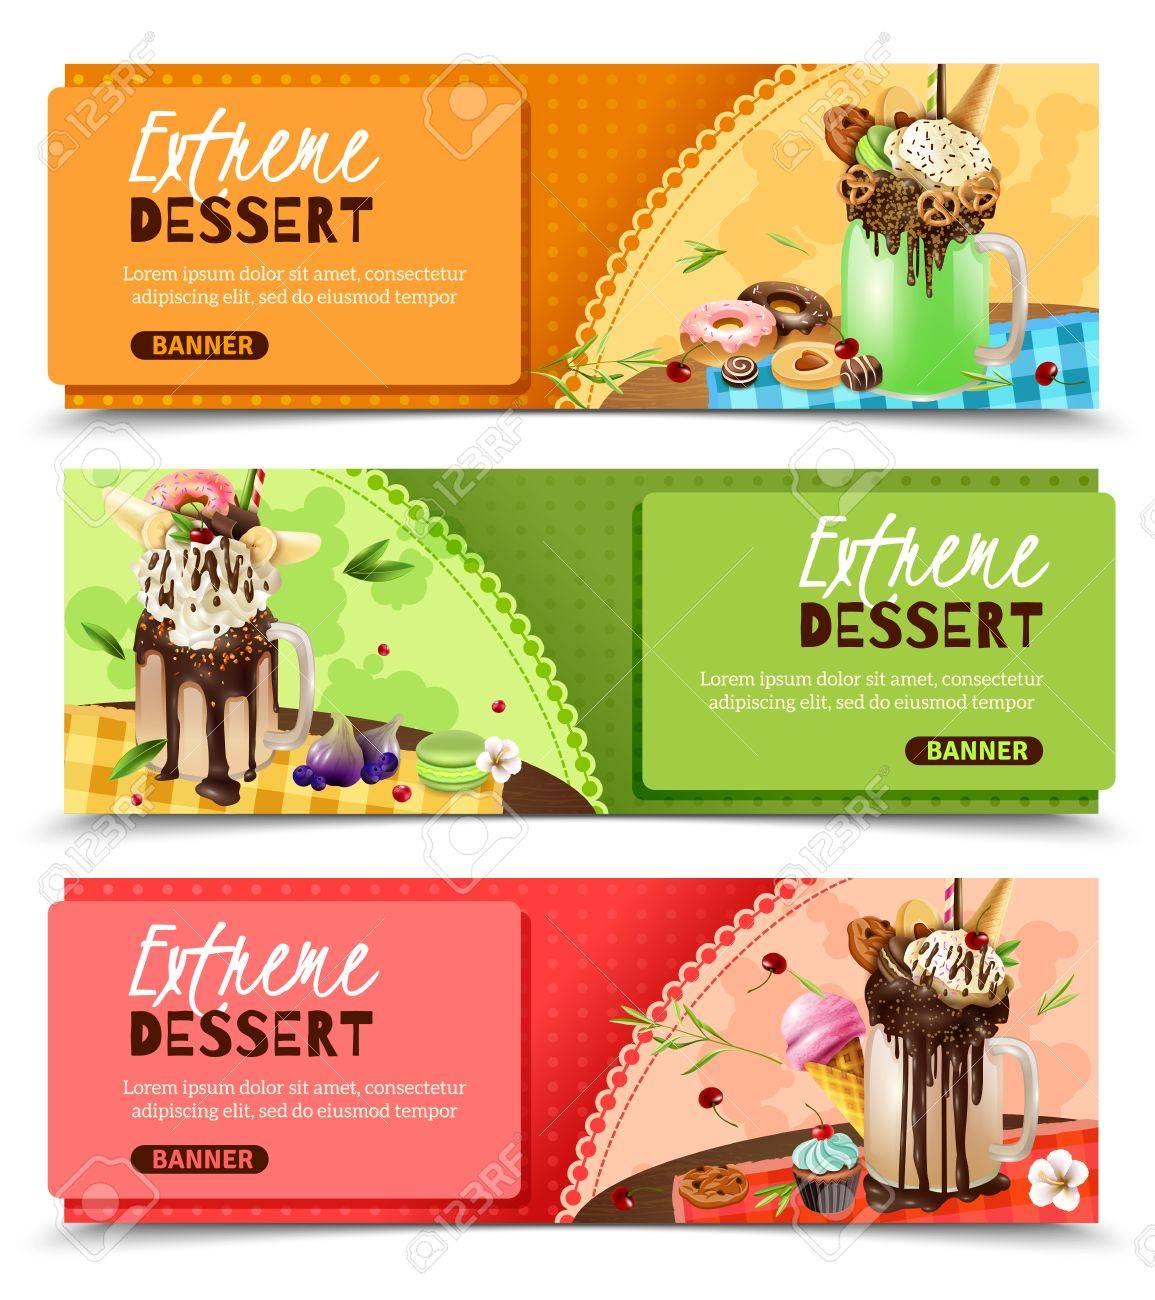 Super Sweet Rich Extreme Desserts Recipes Ideas 3 Horizontal ...